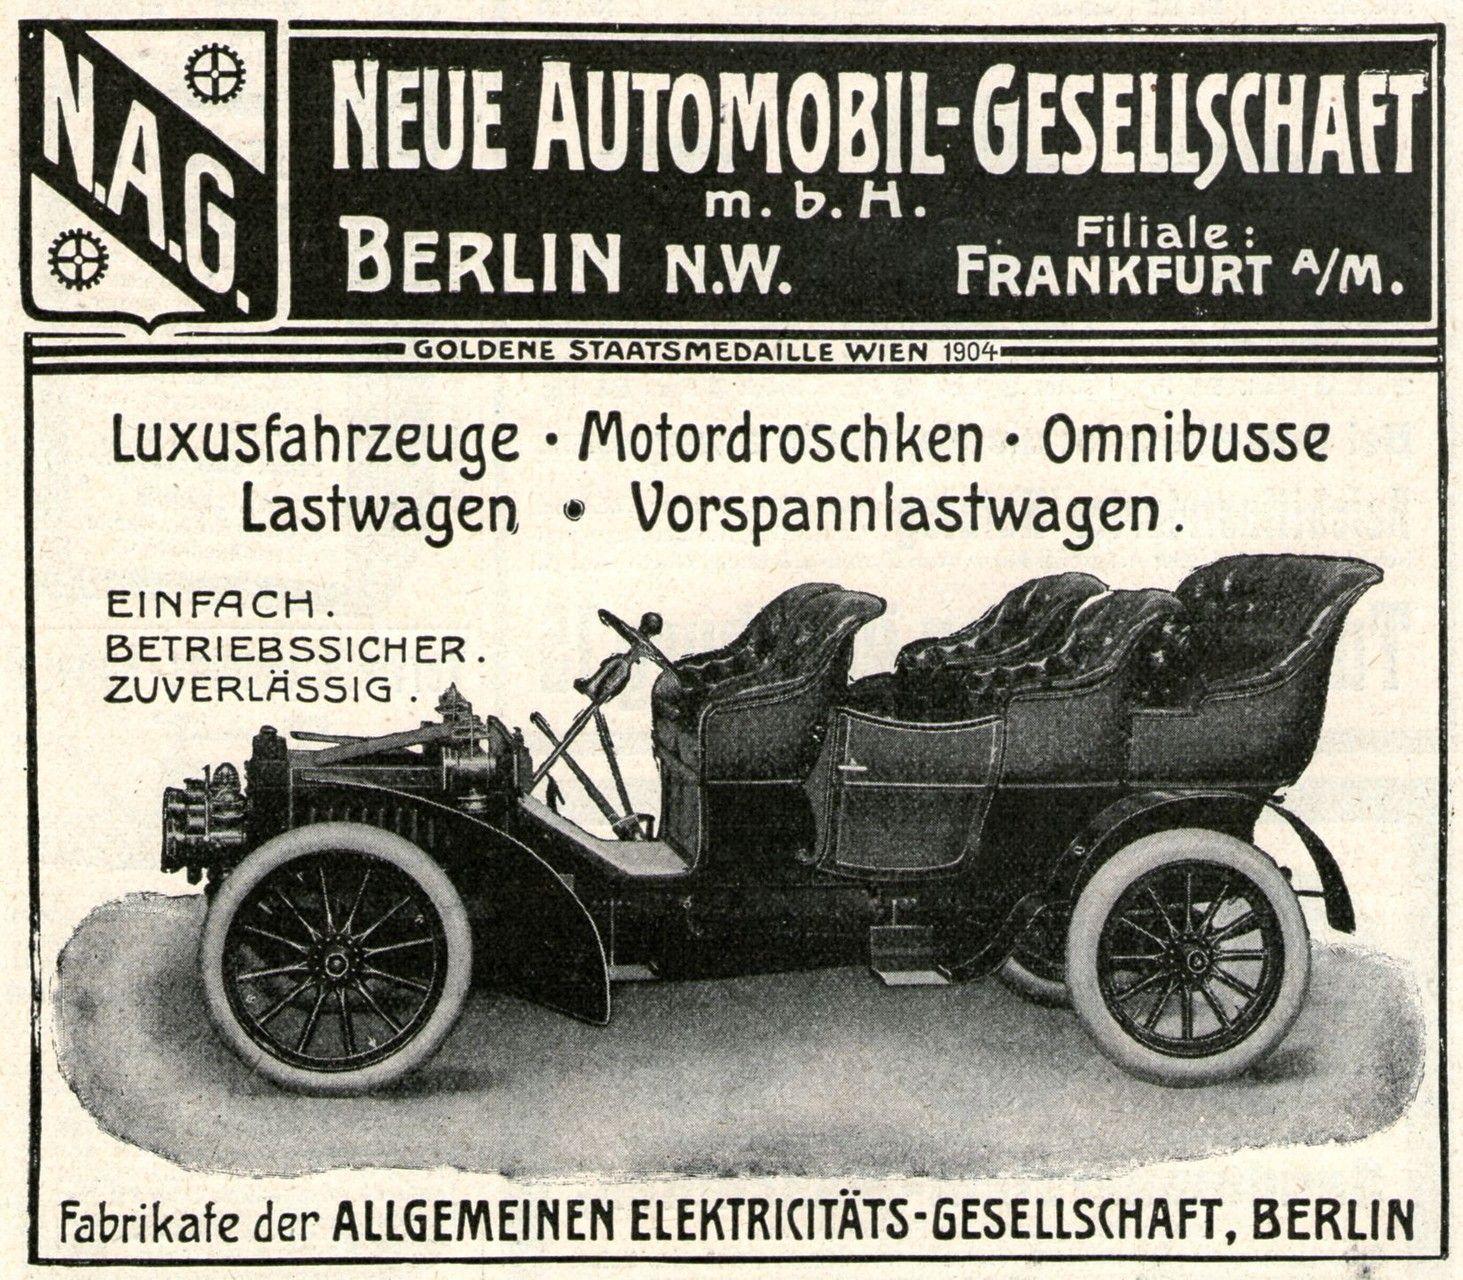 Pin by Historische Print - Werbung / Vintage Advertising on Vintage ...